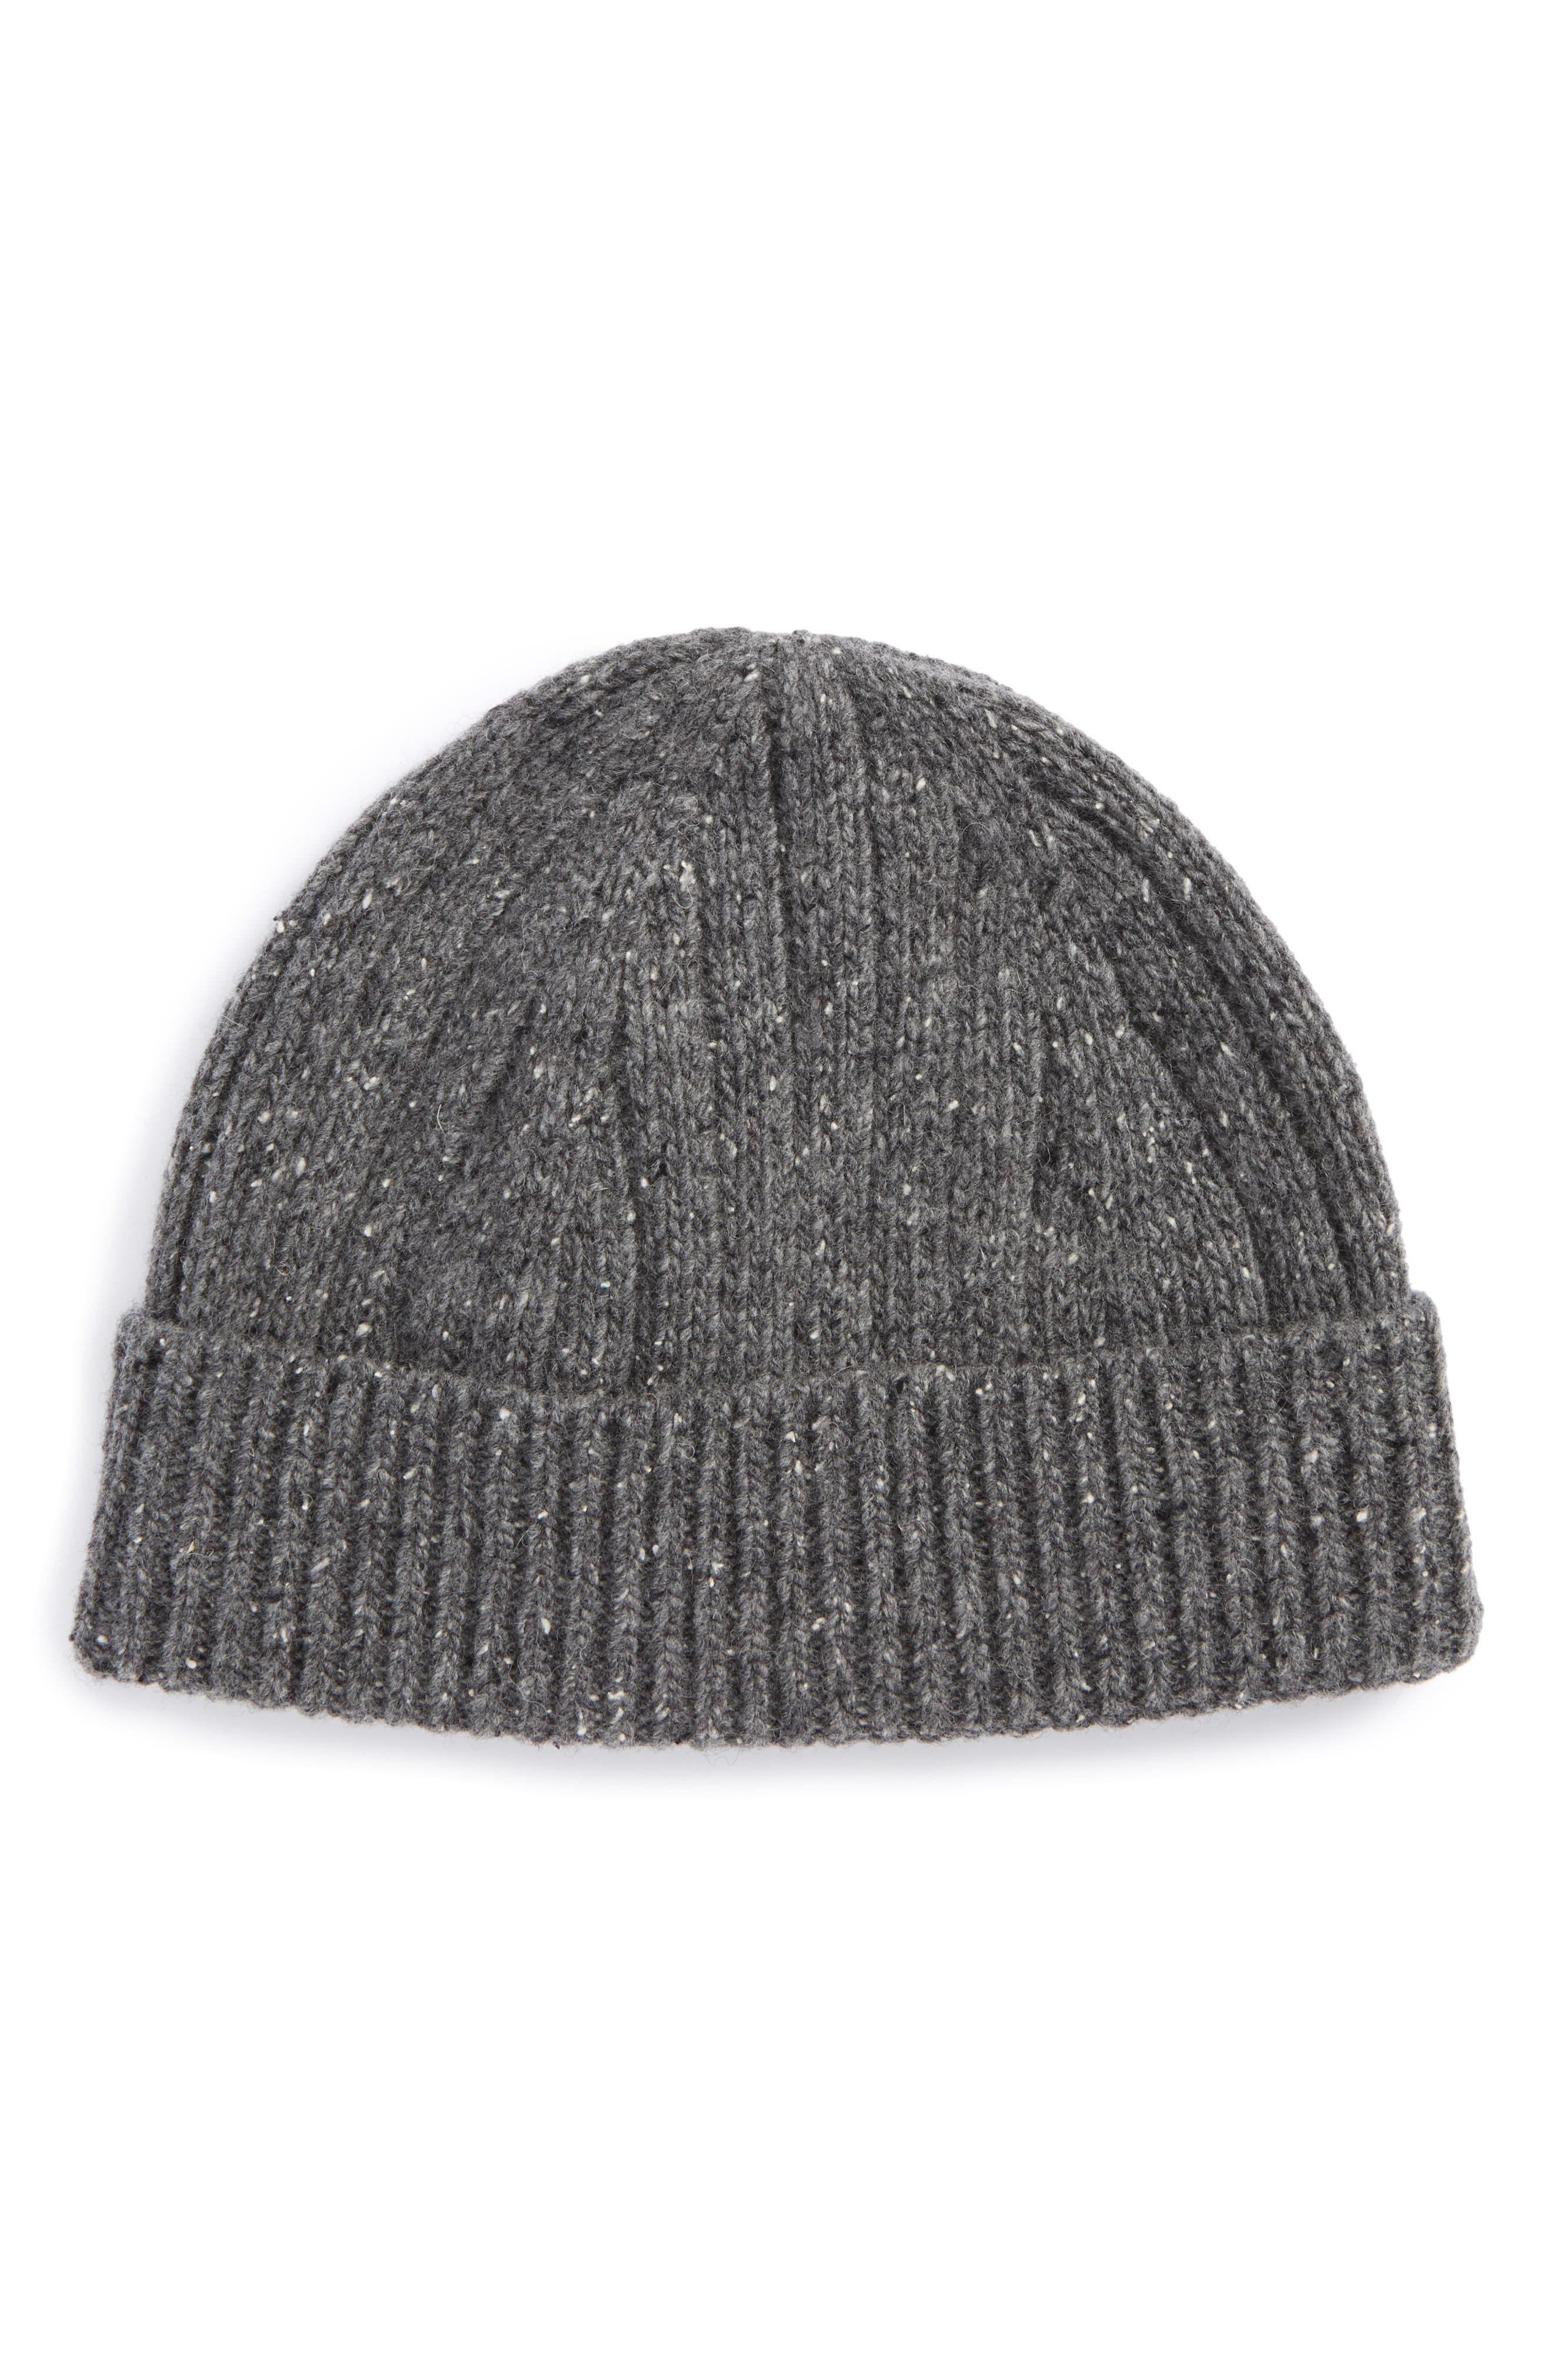 Nordstrom Men's Shop Wool Blend Beanie